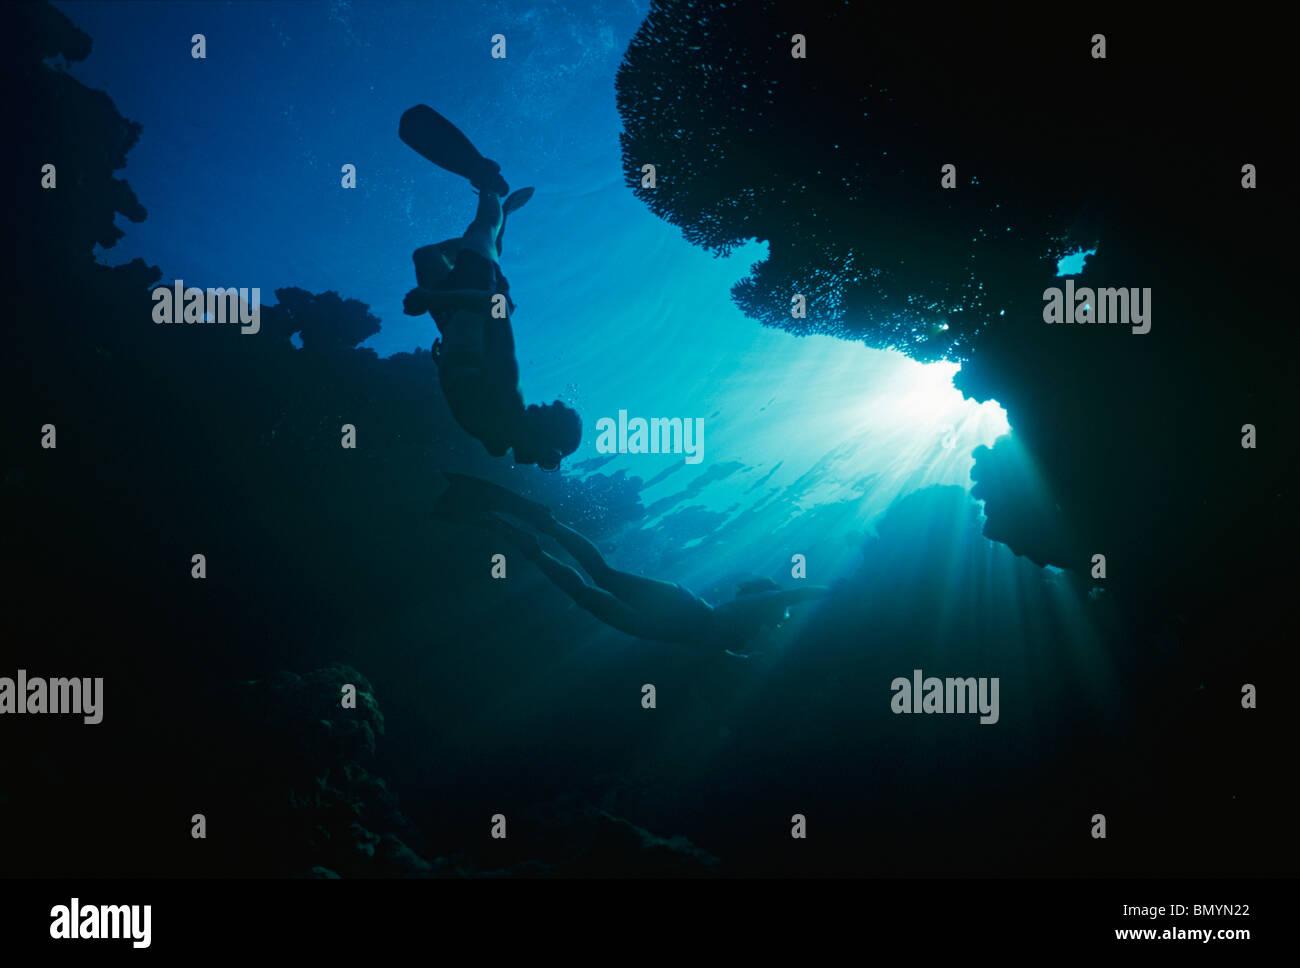 Freitauchen in Korallengarten - Insel Tiran, Rotes Meer, Ägypten Stockbild